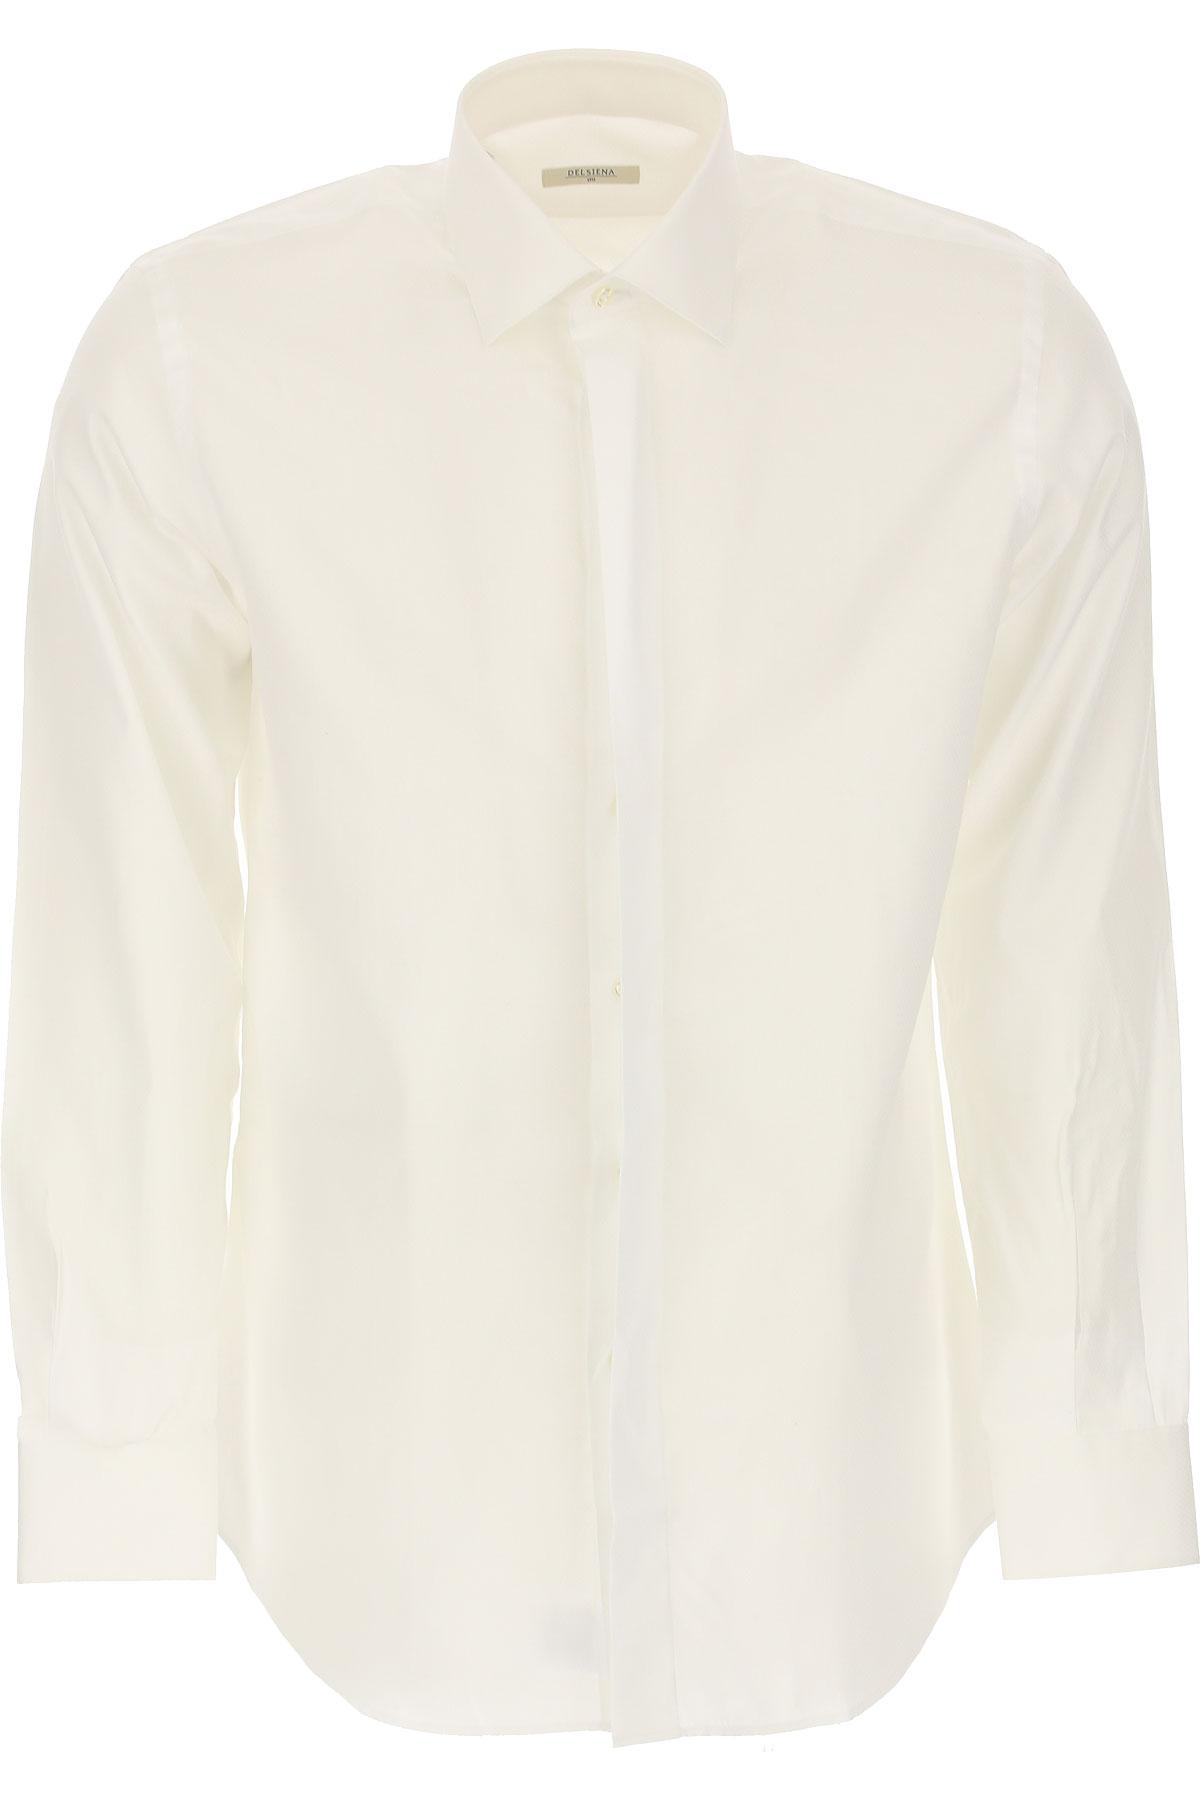 Del Siena Shirt for Men On Sale, White, Cotton, 2019, 15 15.5 15.75 16 16.5 17 17.5